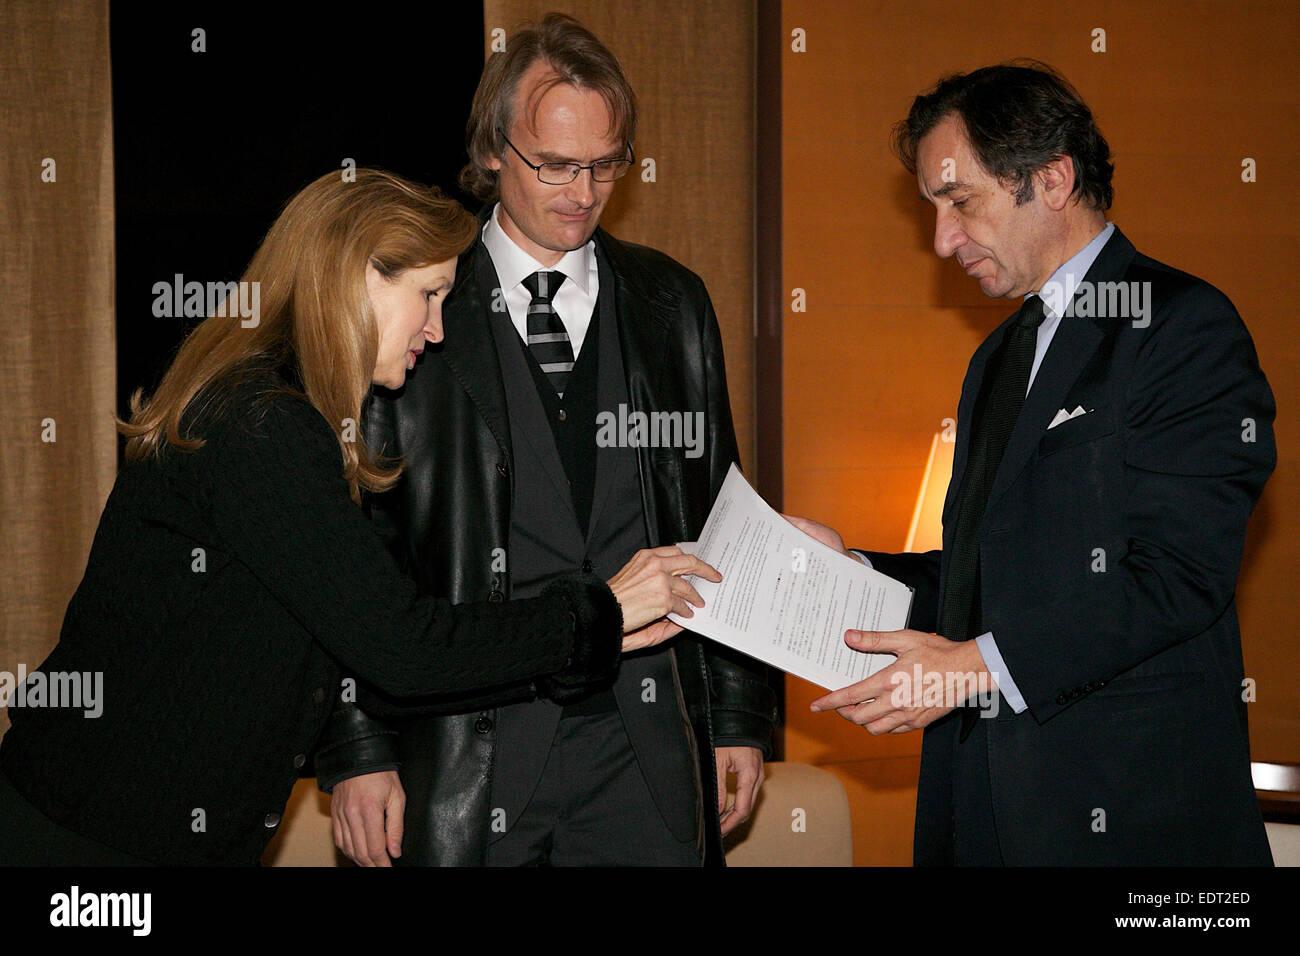 Tokio, Japan. 9. Januar 2015. (L, R) Lucy Birmingham, Richard Lloyd Parry, Thierry Dana, (L, R) Lucy Birmingham Stockfoto